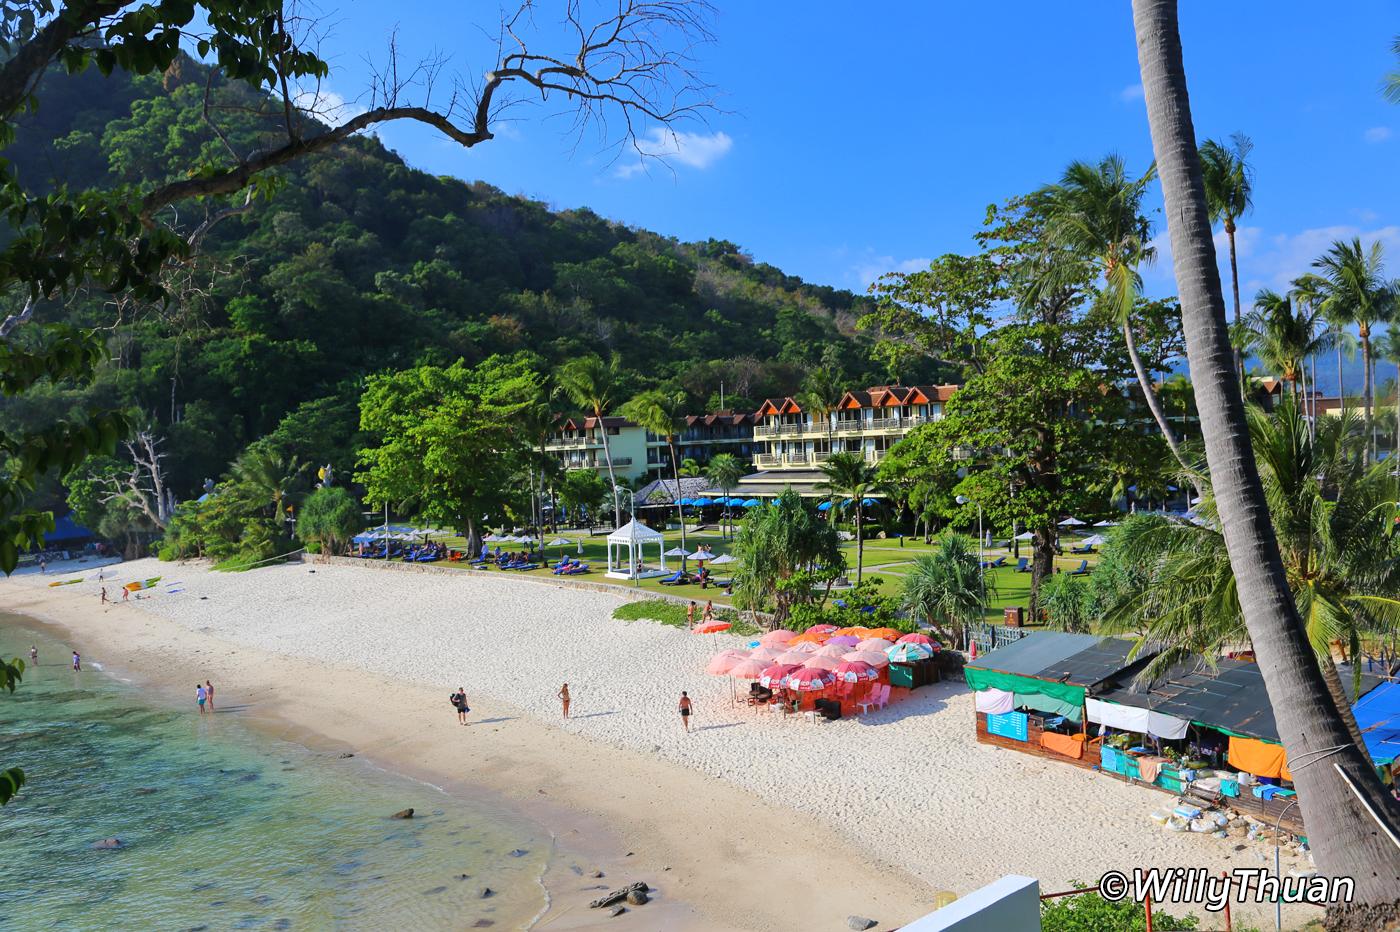 Merlin Beach Phuket – A great snorkeling beach near Patong